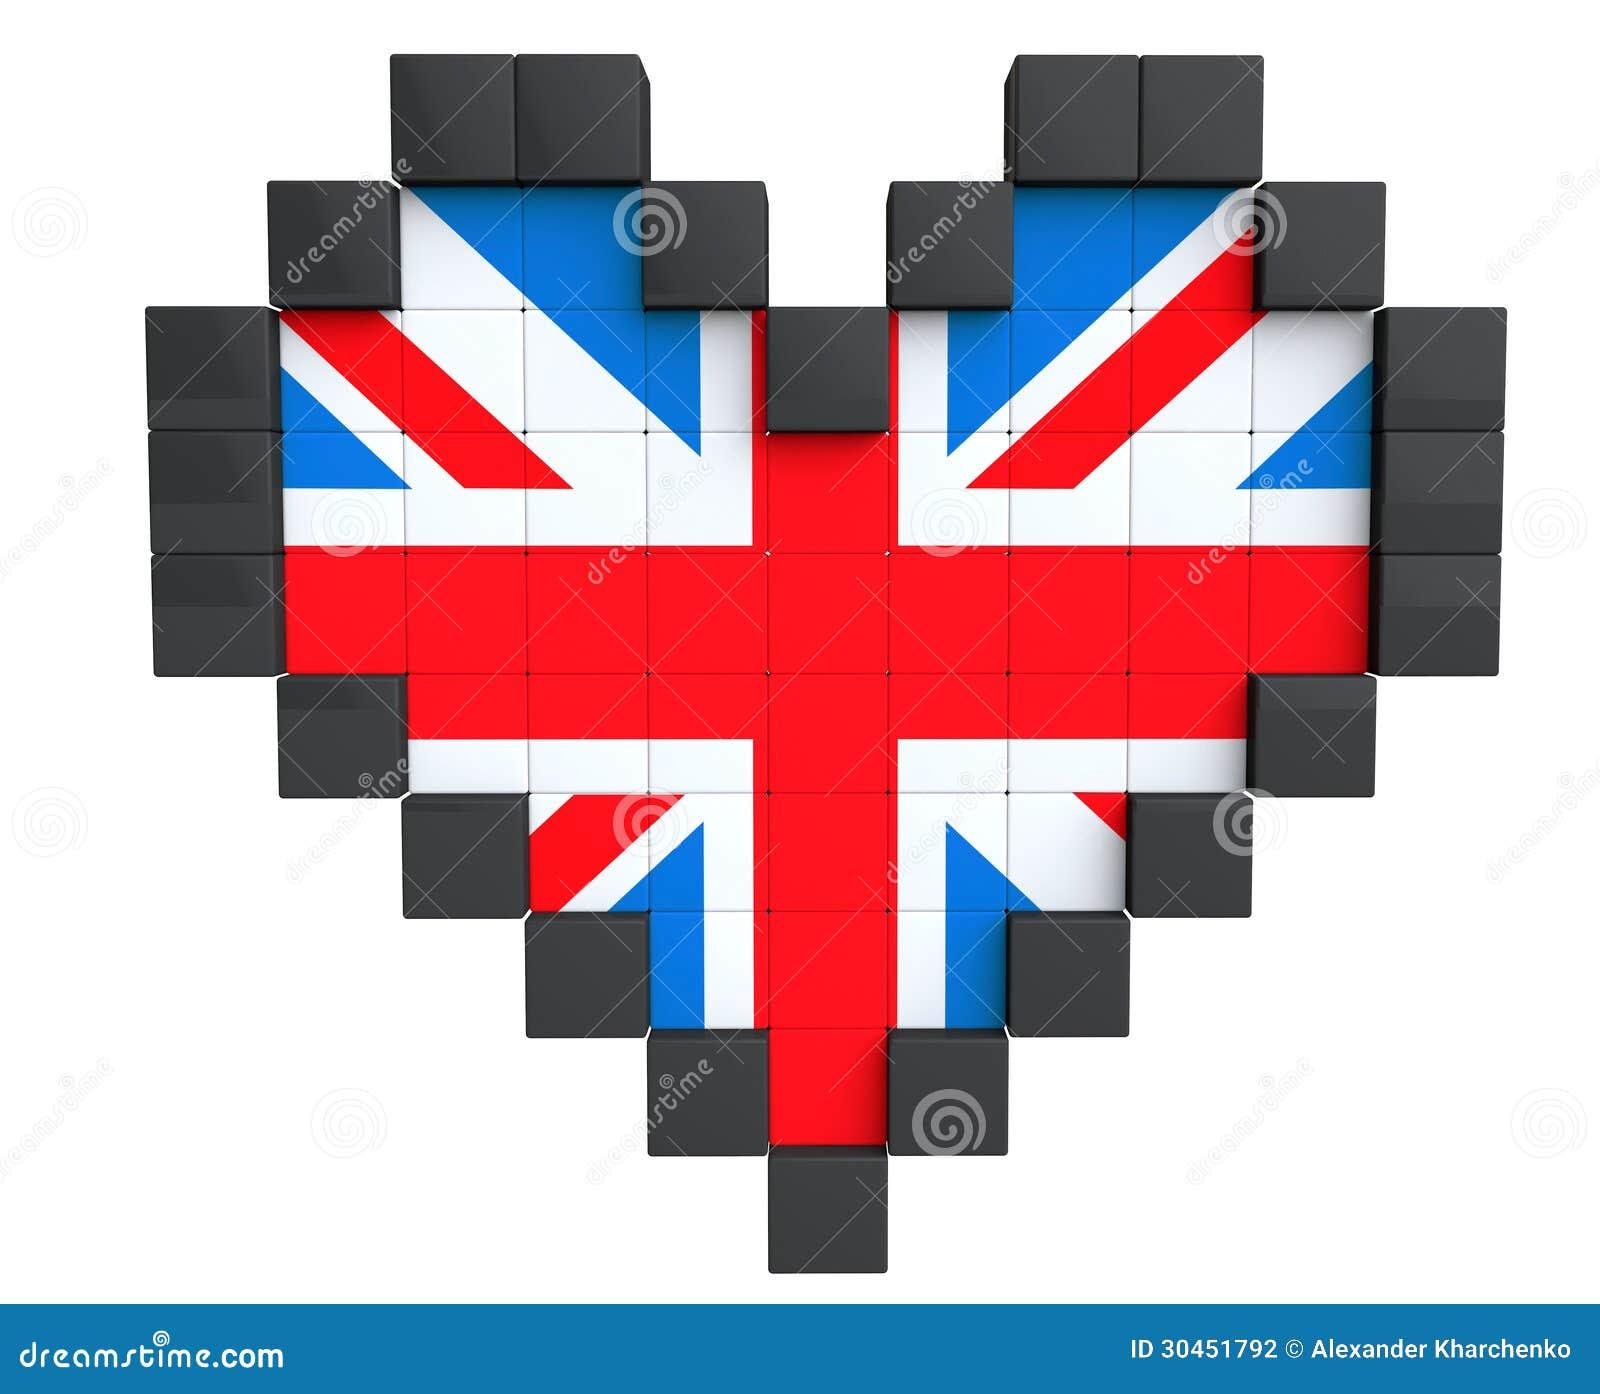 Pixel Heart As United Kingdom Flag Stock Illustration Illustration Of Flag Heart 30451792